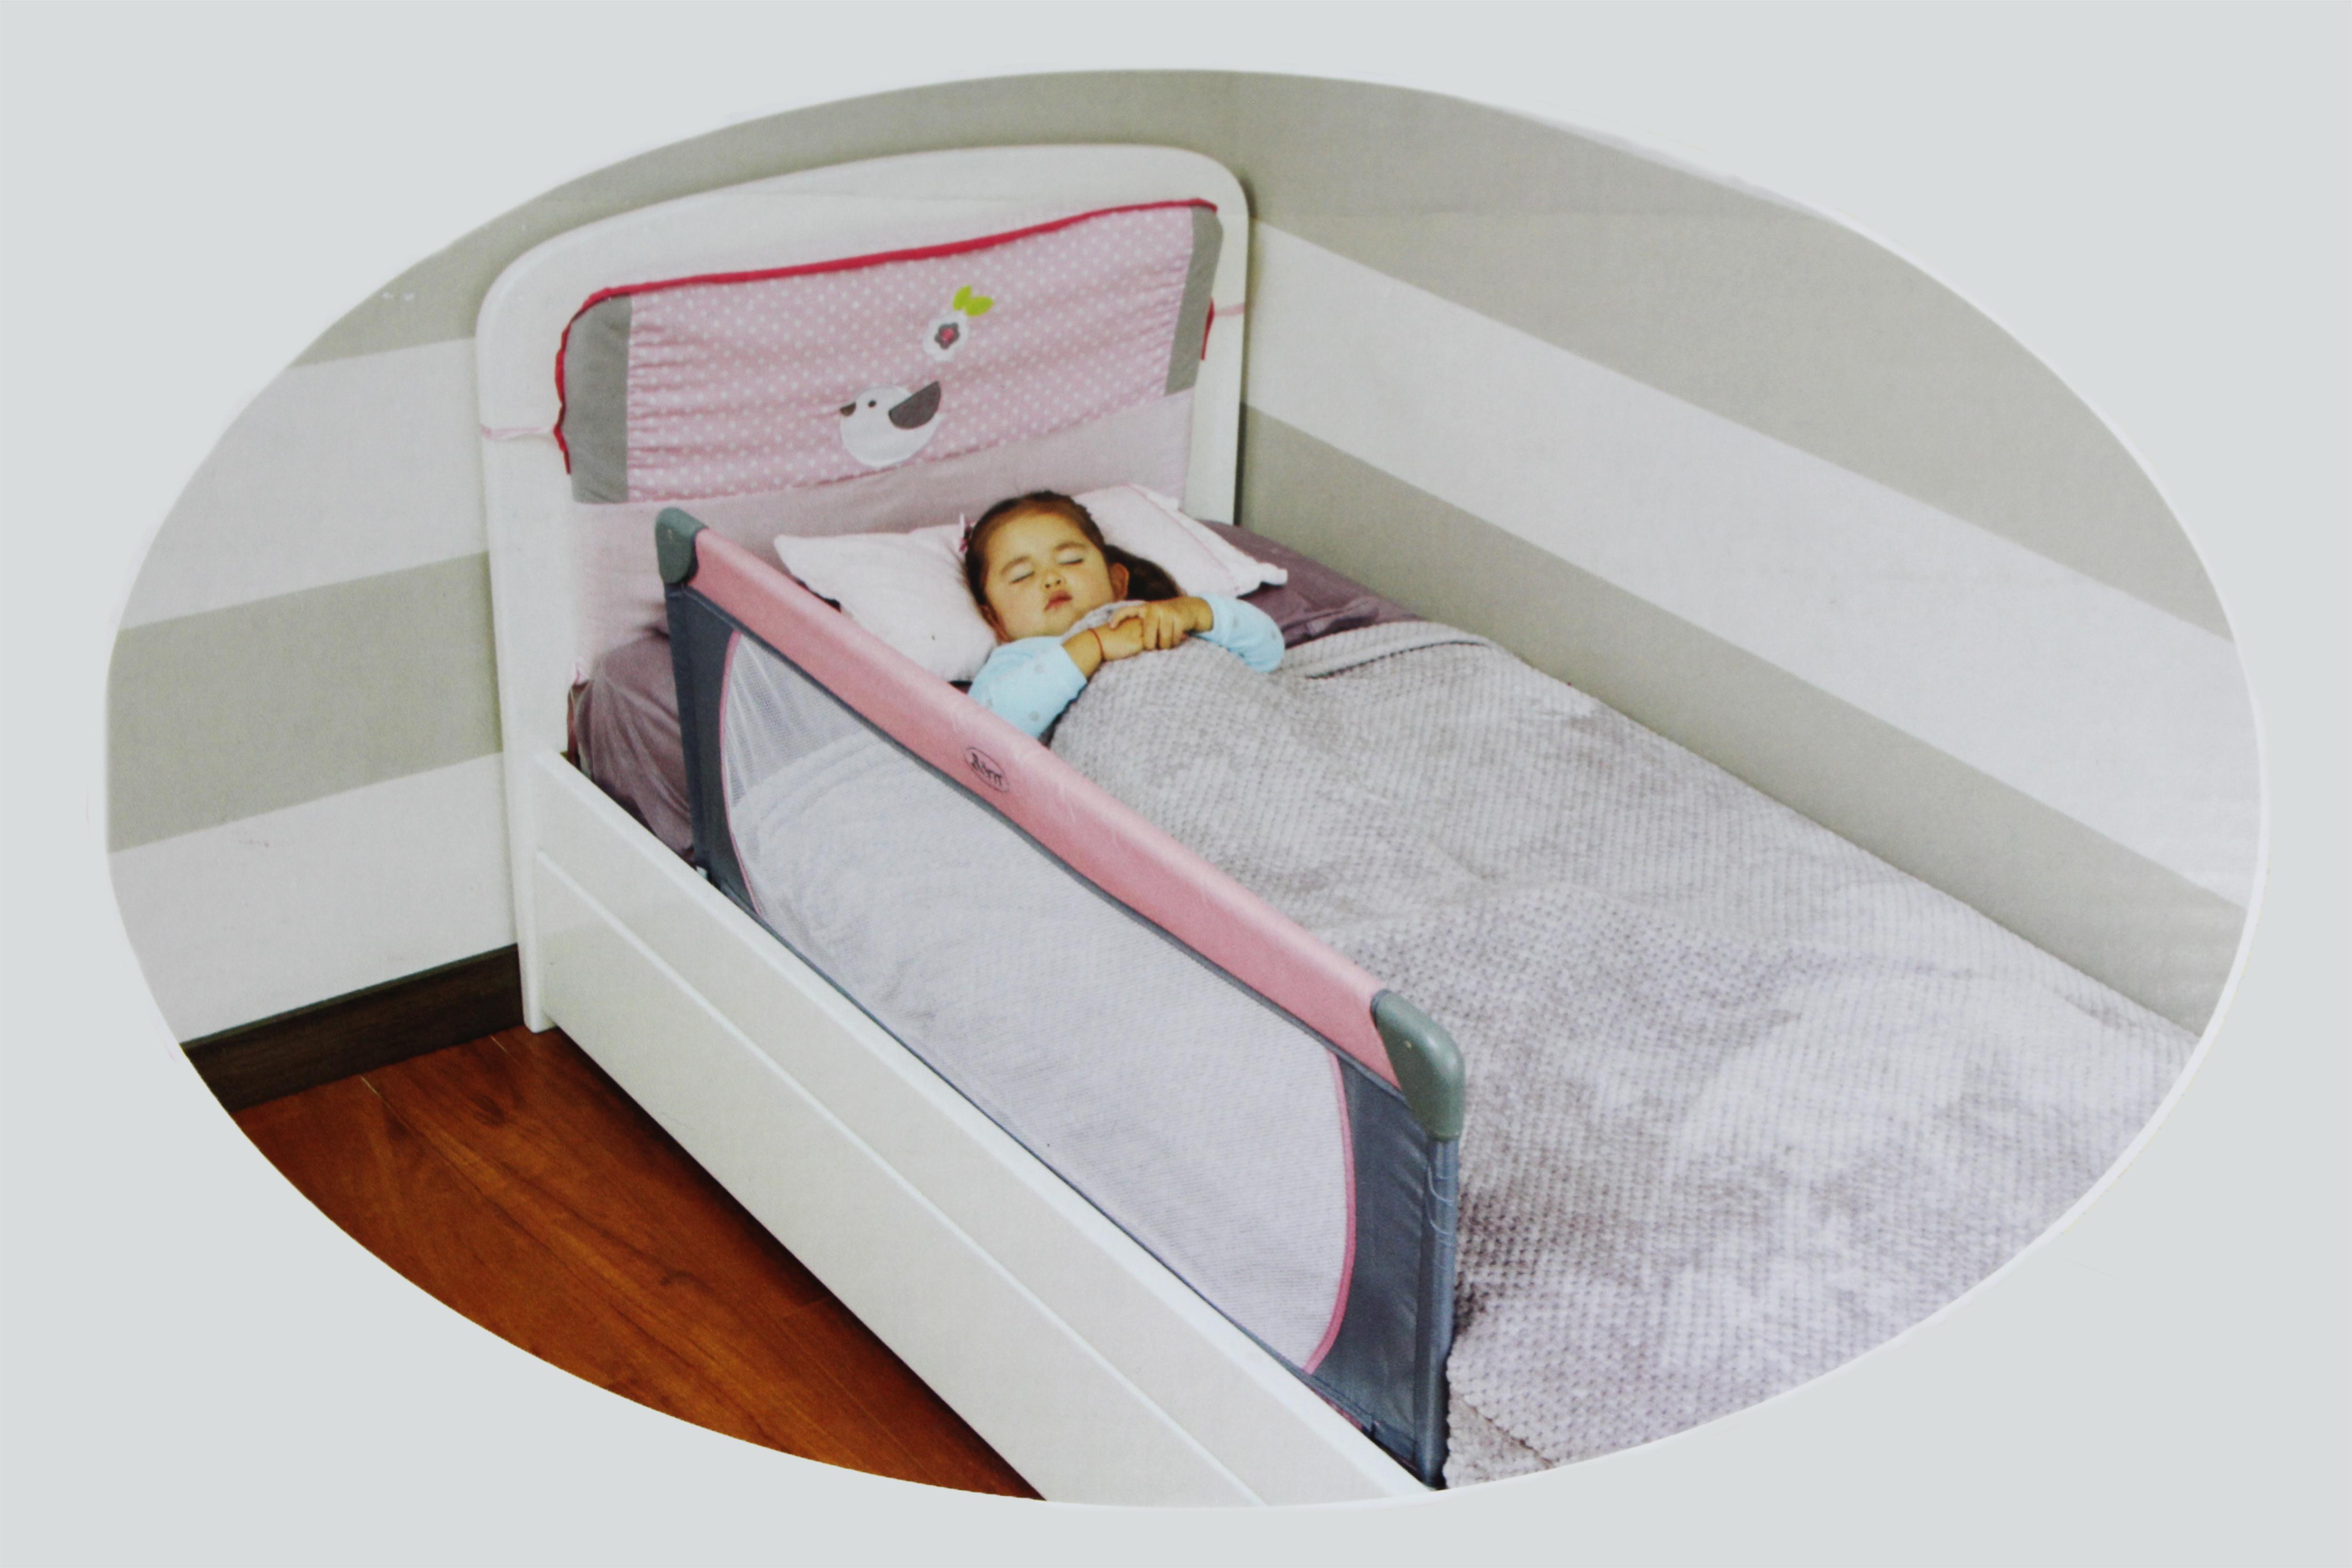 Barandilla de la Cama de beb/é Cama de ni/ño barandilla de Malla Transpirable de elevaci/ón Vertical de Ajuste de 6 velocidades for Camas Infantiles Camas empotradas Camas Planas